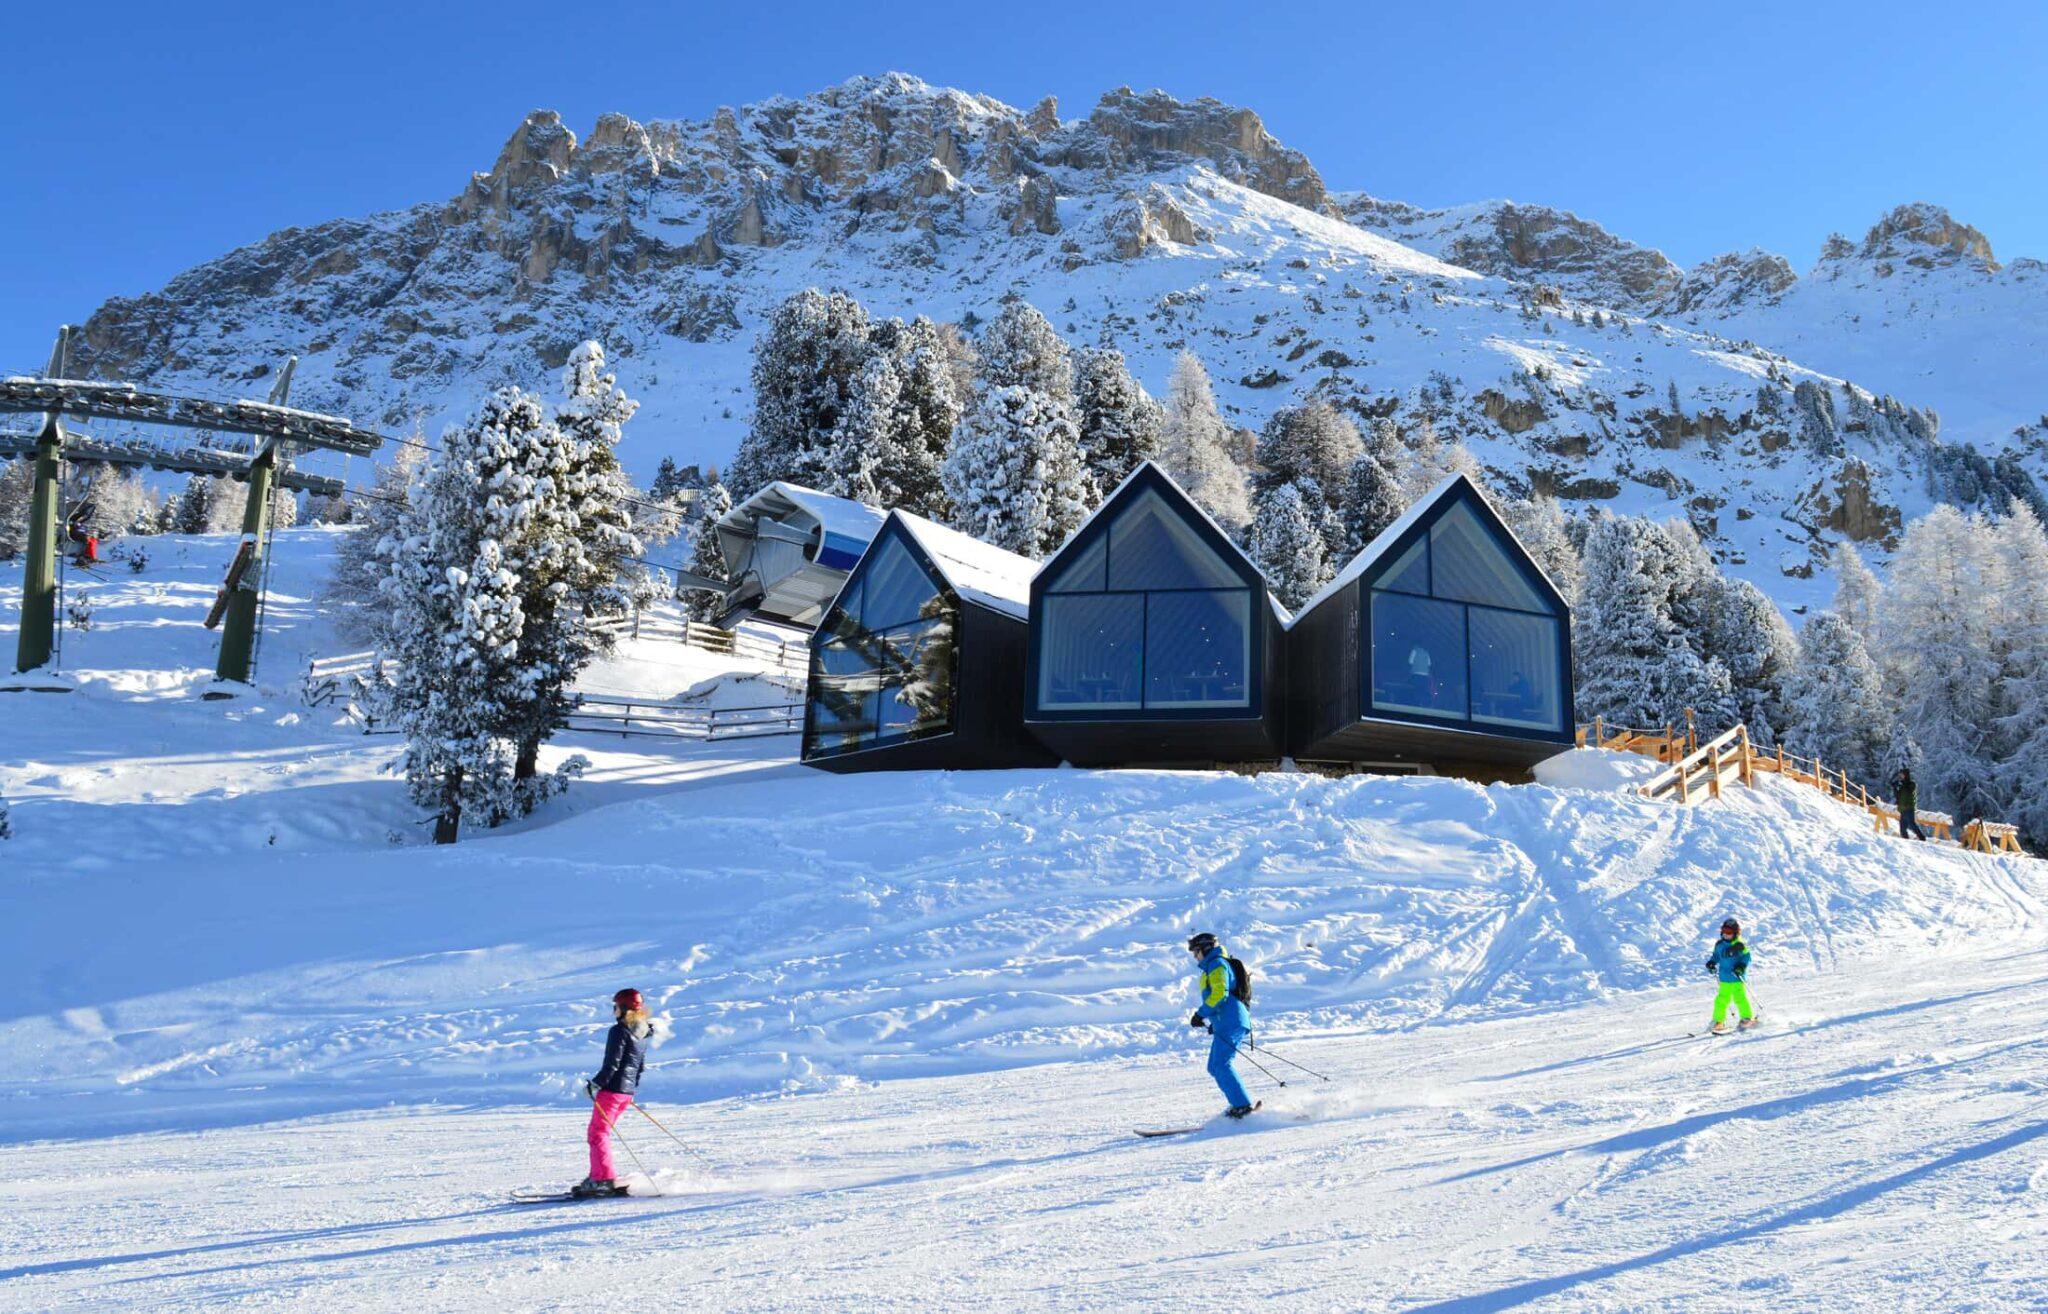 Rifugio Oberholz, Ski center Latemar - foto Thomas Ondertoller